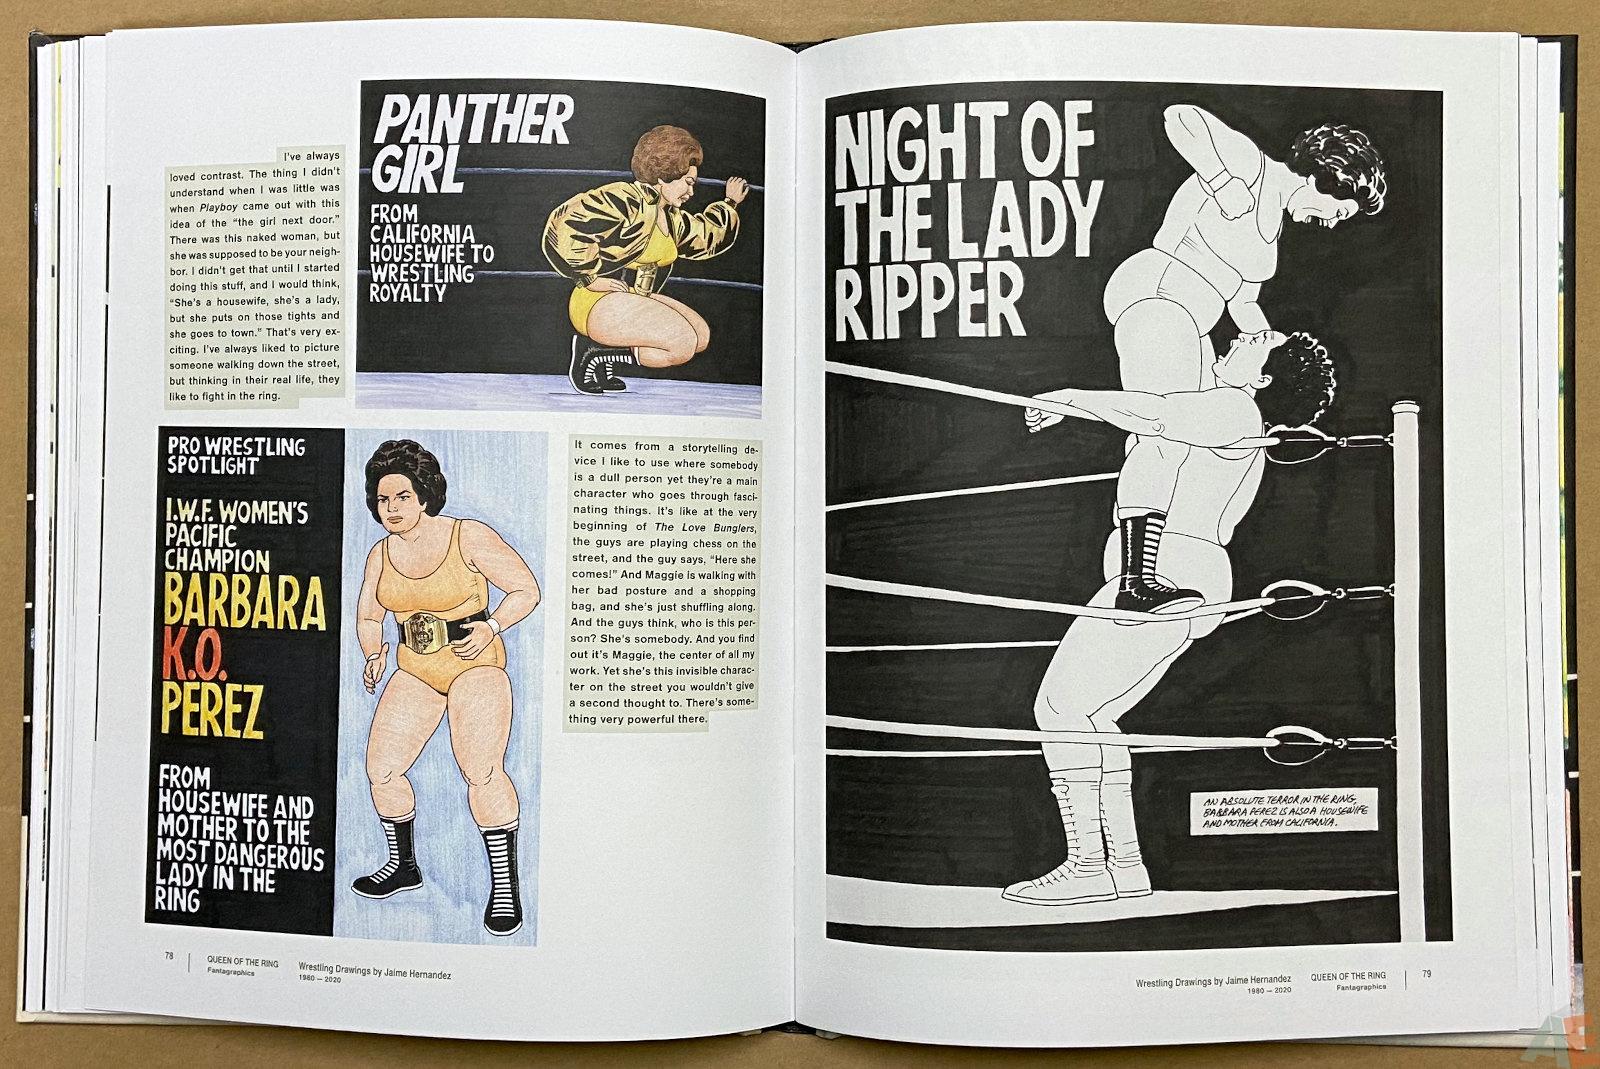 Queen of the Ring Wrestling Drawings by Jaime Hernandez 1980 2020 interior 9